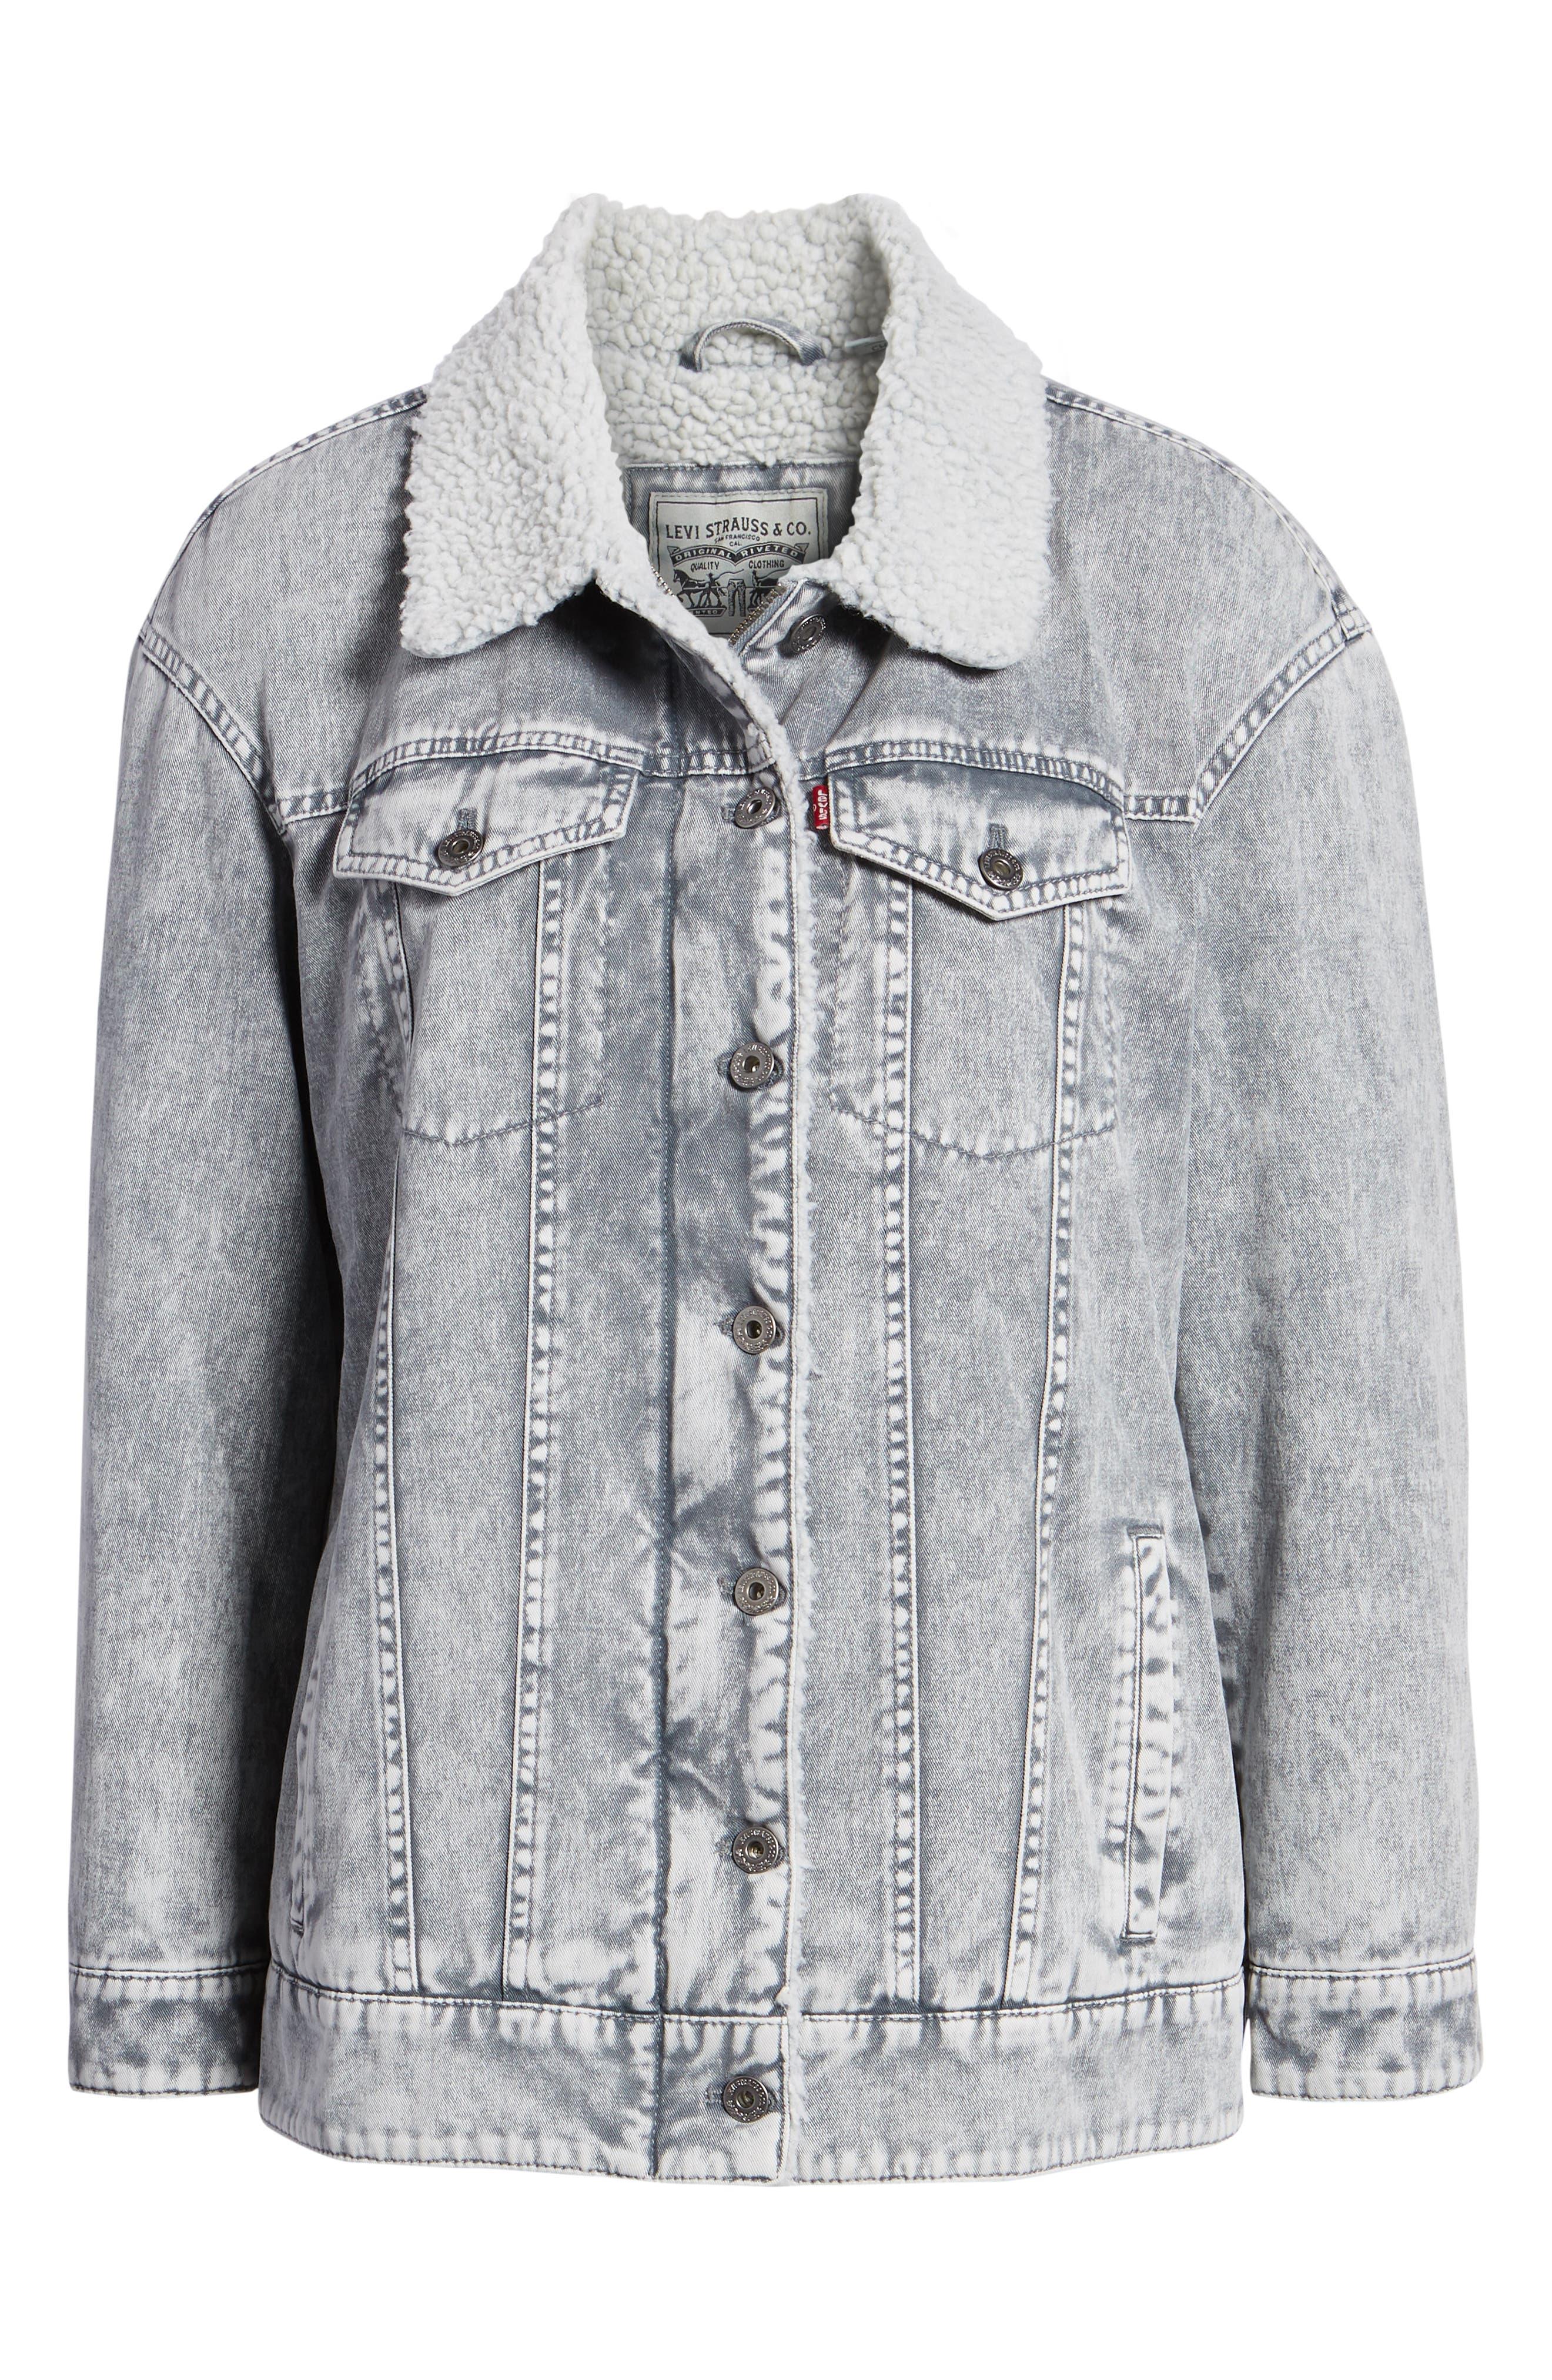 Levi's<sup>®</sup> Oversize Denim Trucker Jacket,                             Alternate thumbnail 6, color,                             GREY